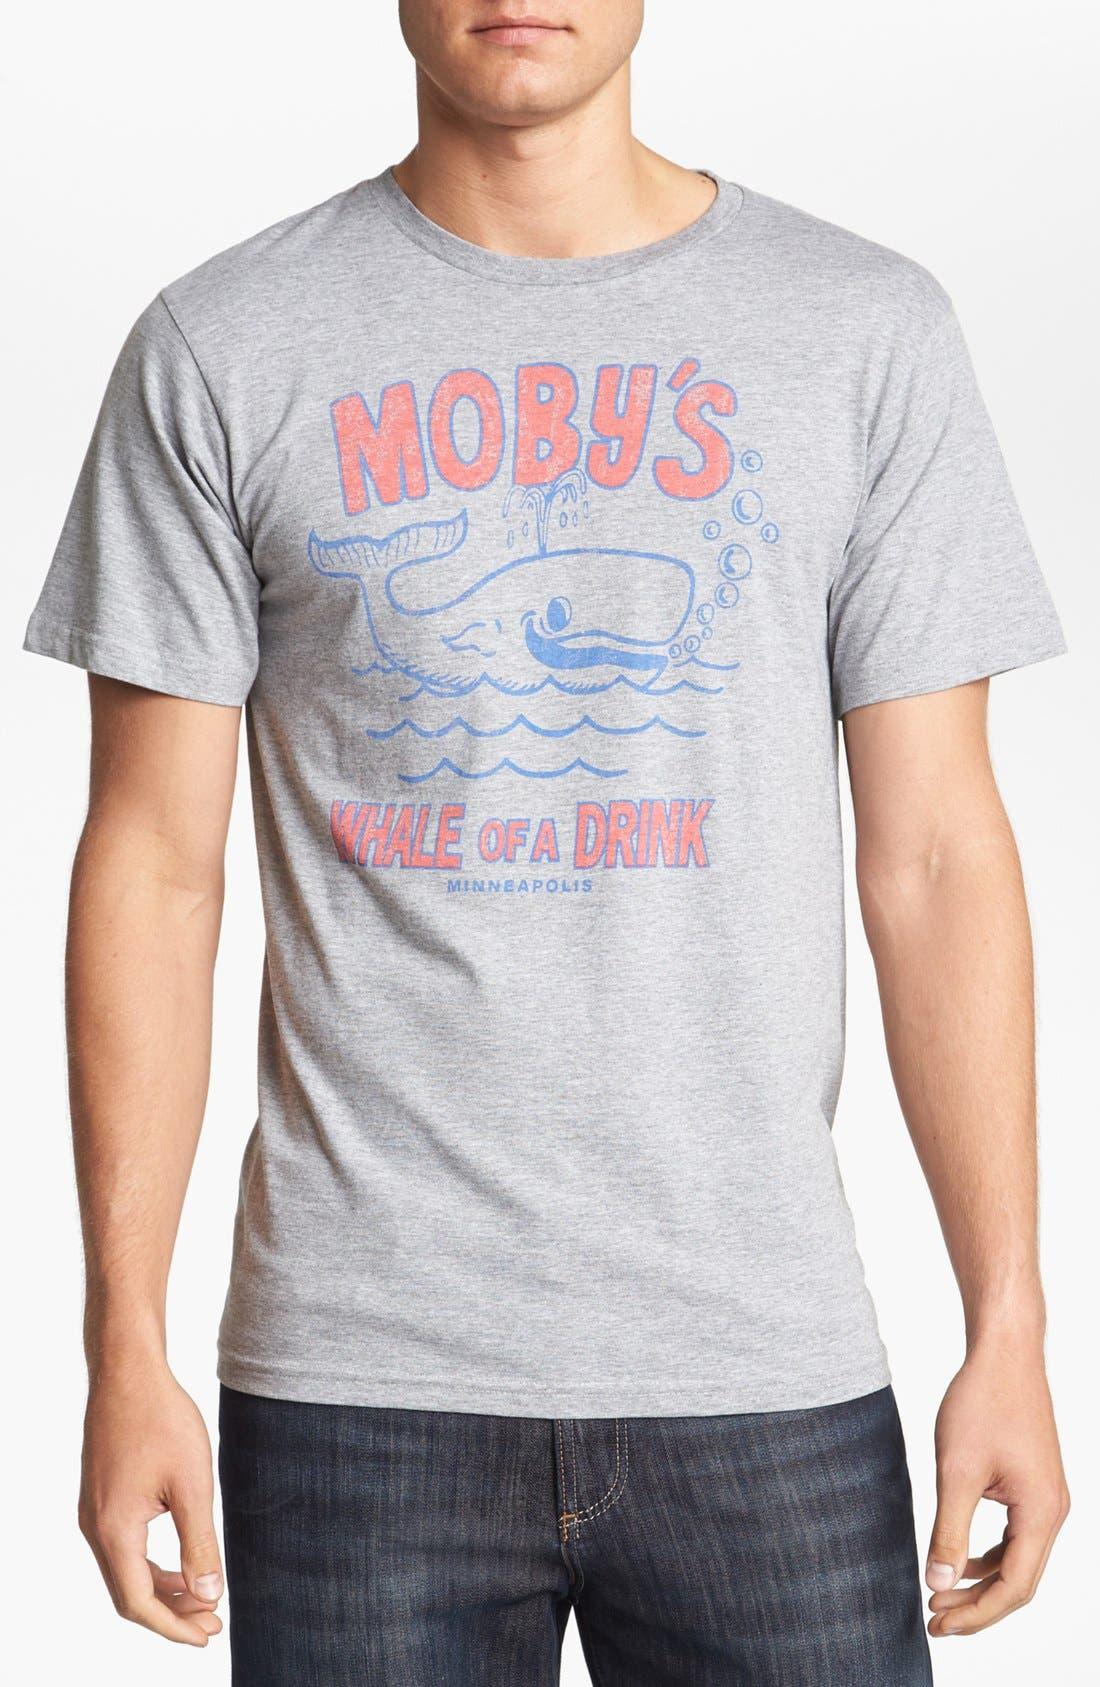 Main Image - Horses Cut Shop 'Moby Dick's' T-Shirt